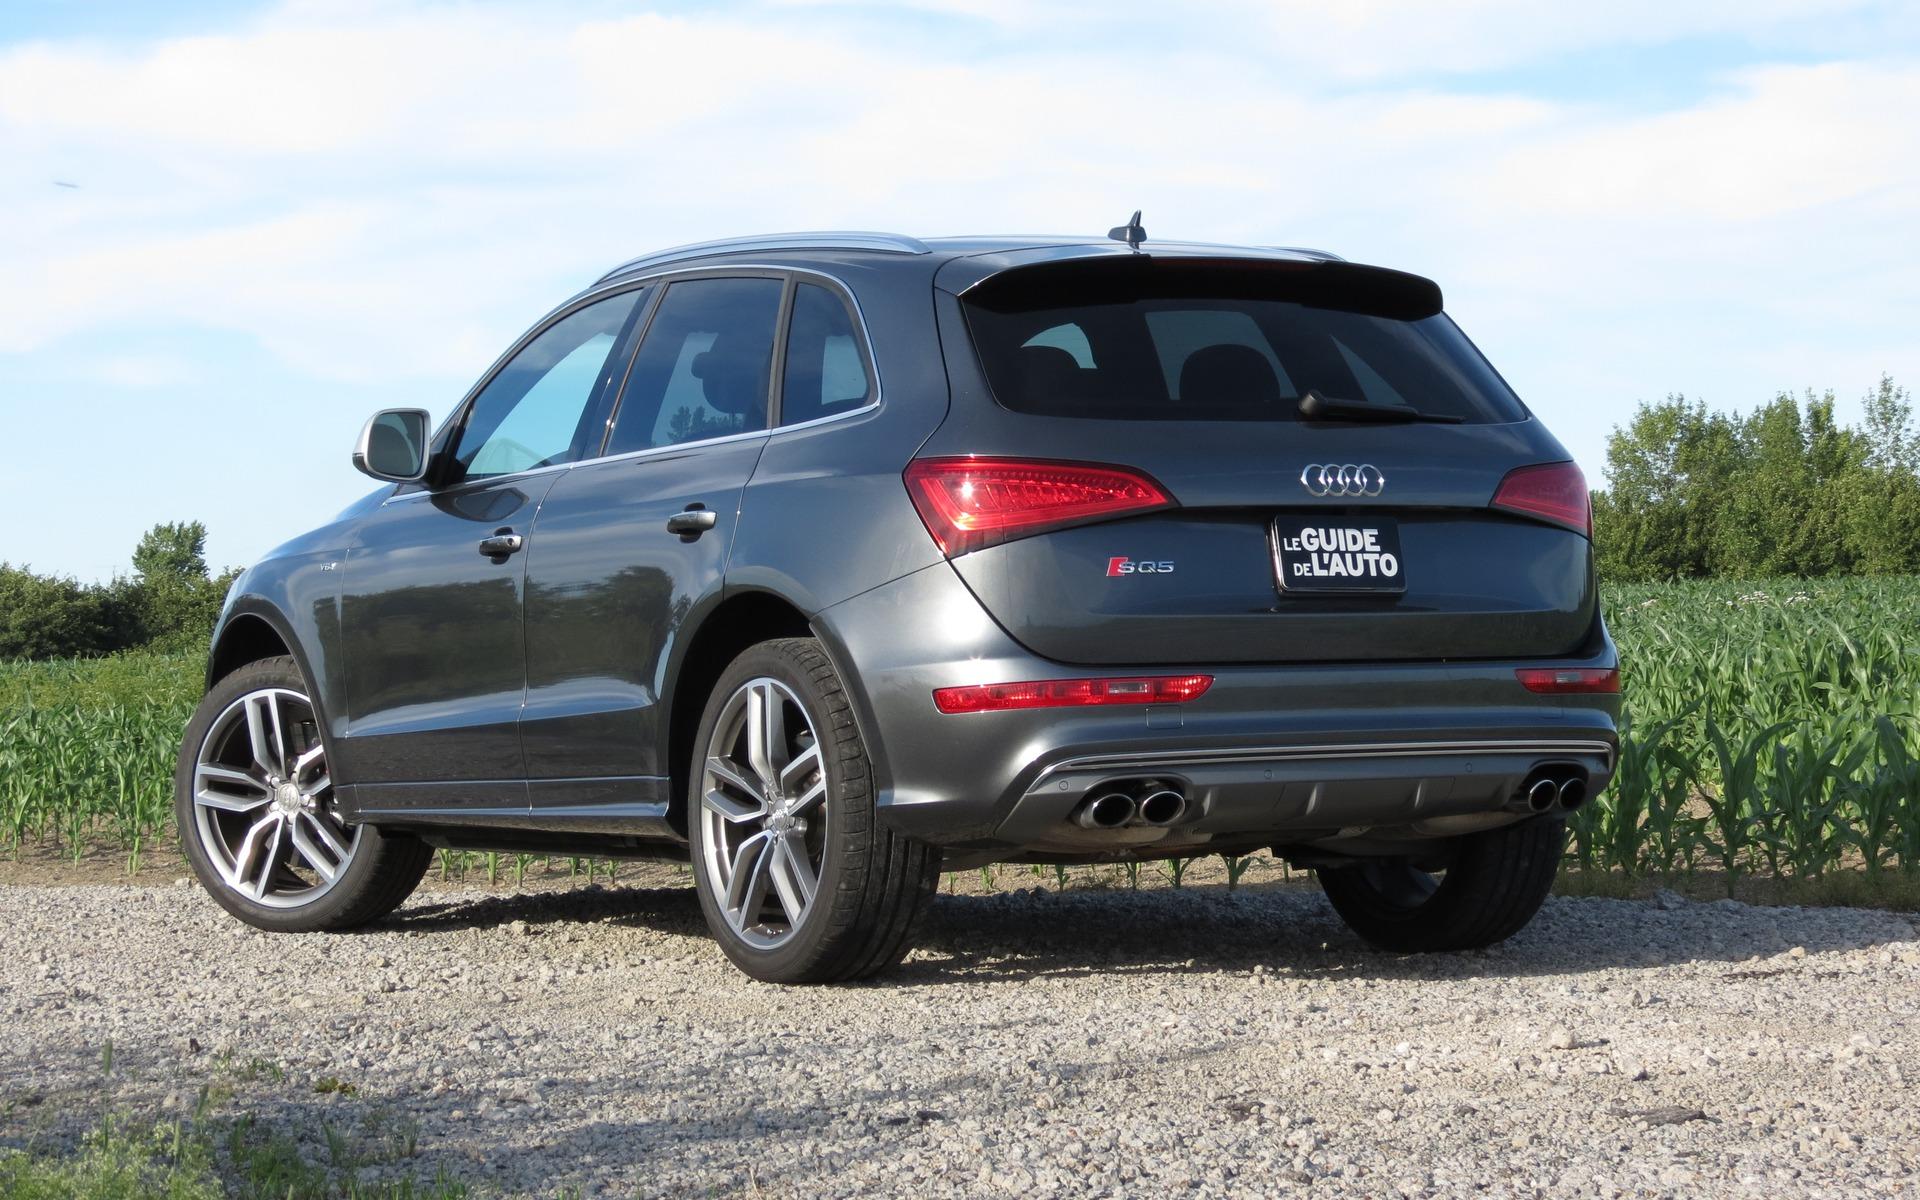 Kelebihan Kekurangan Audi Q5 2016 Review